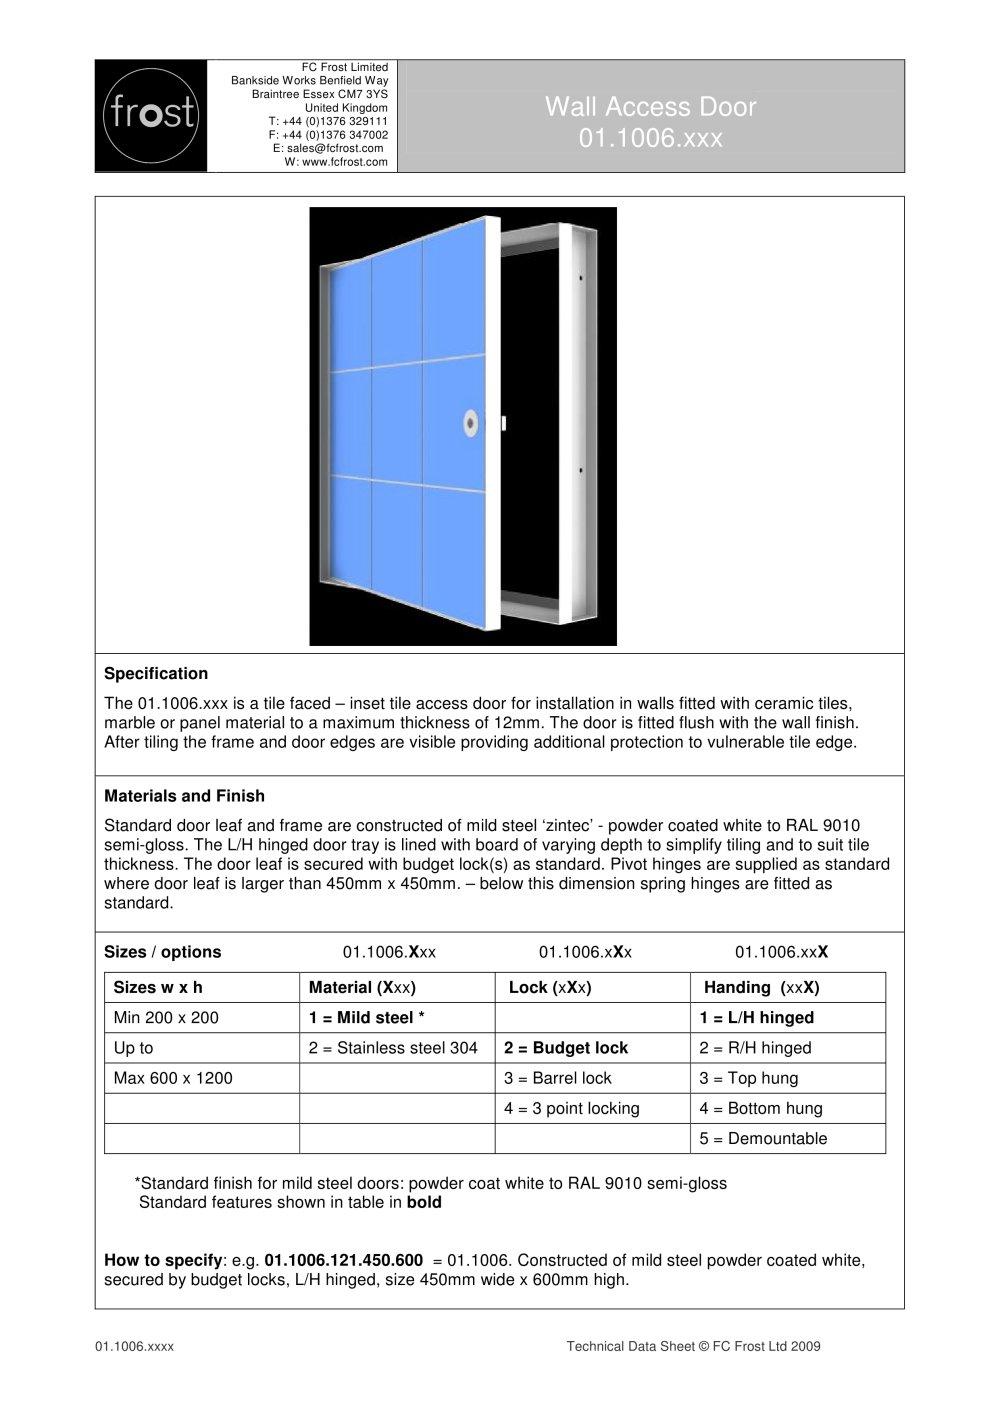 access door fc frost pdf catalogues documentation brochures